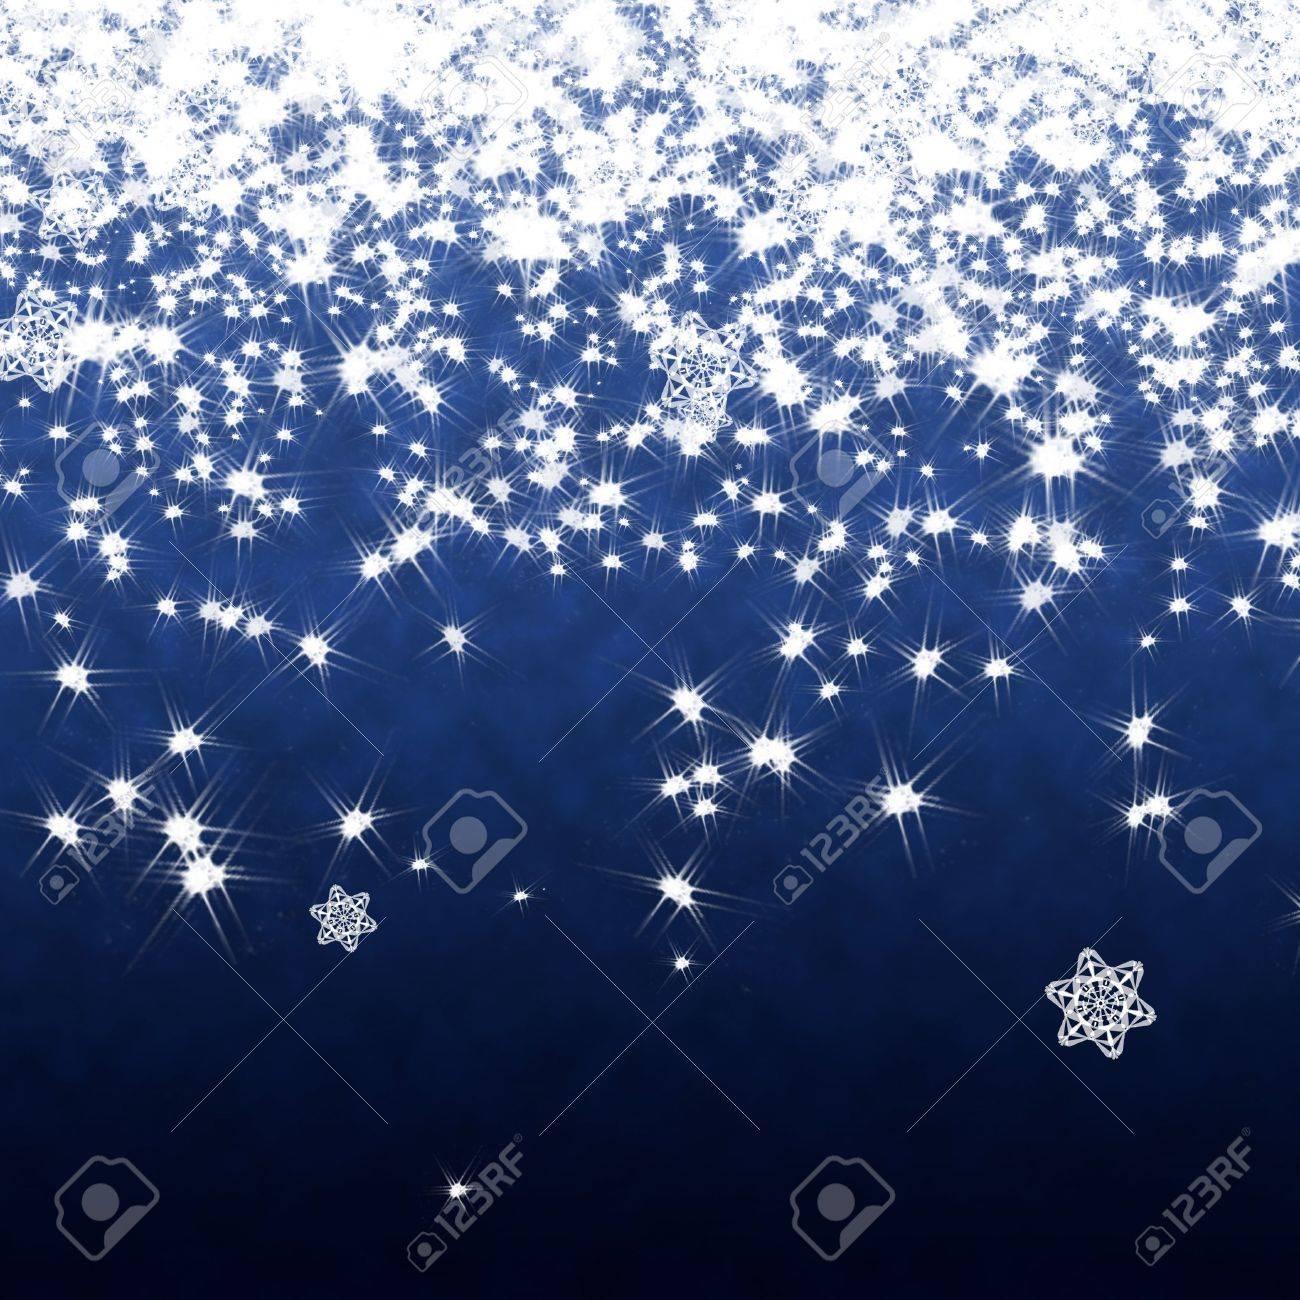 Star falling background Stock Photo - 11698109